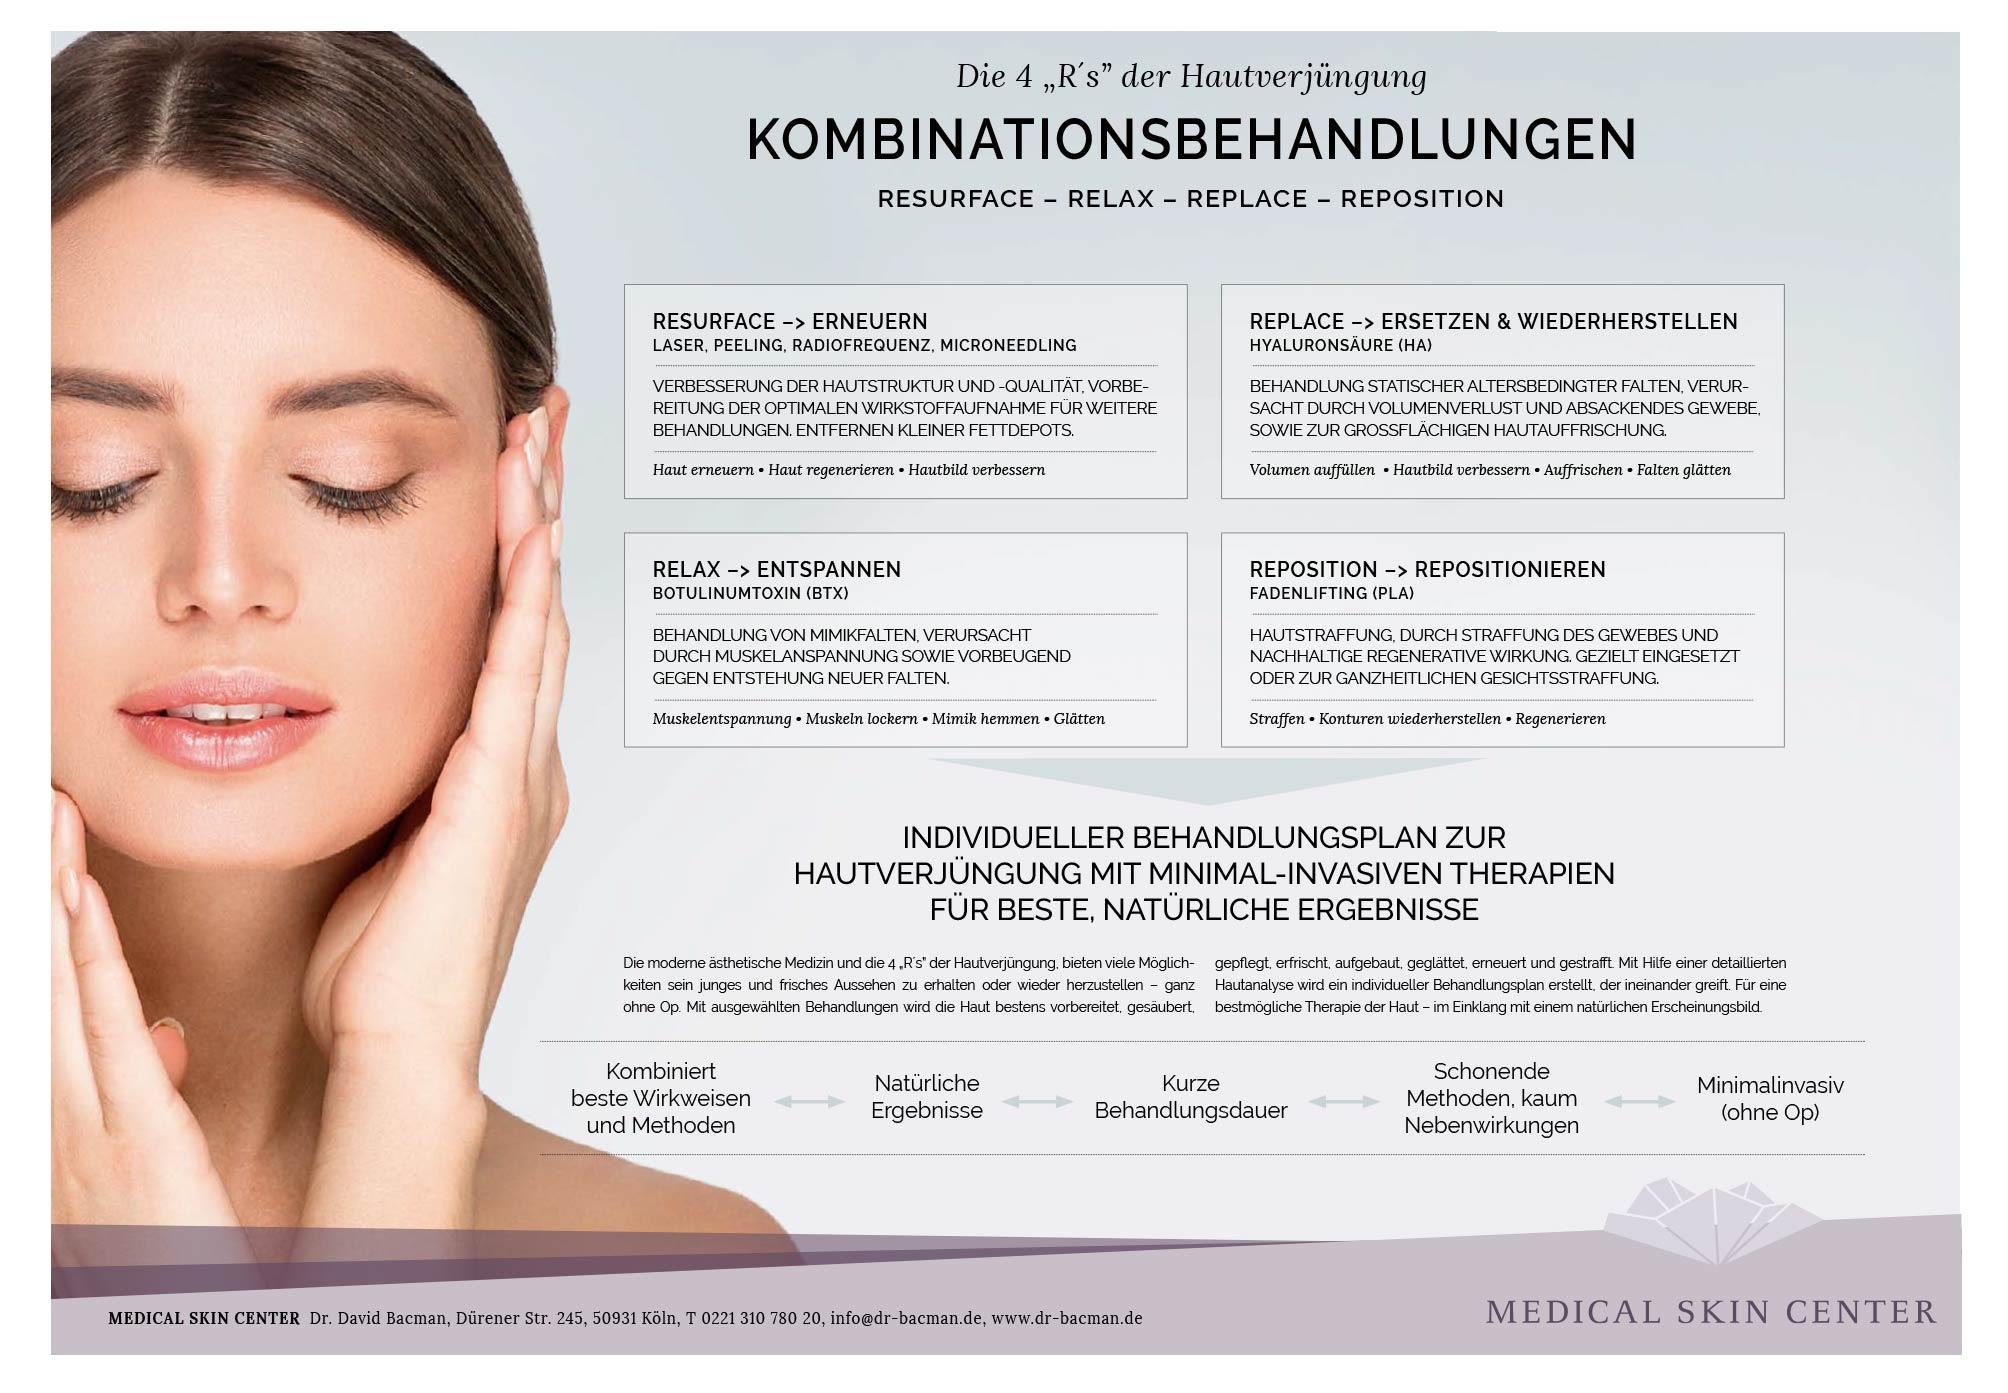 Infografik zu Kombibehandlungen in der Ästhetik 4Rs der Hautverjüngung Köln